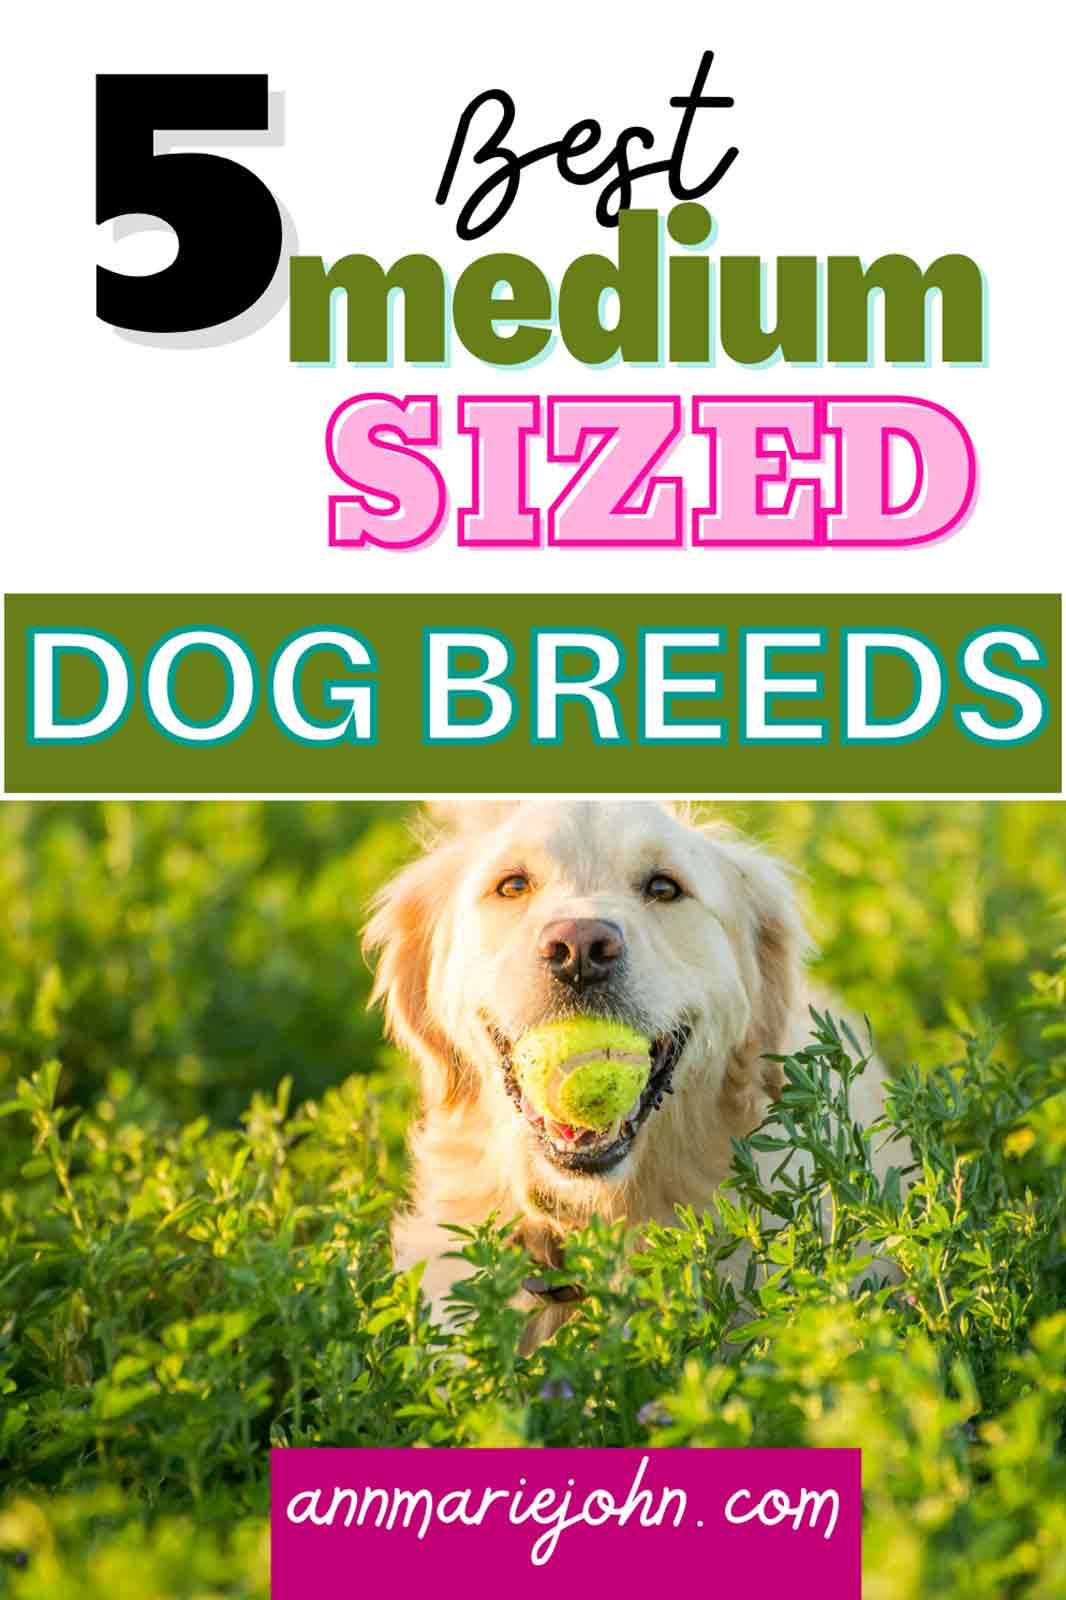 The Best Medium-Sized Dog Breeds